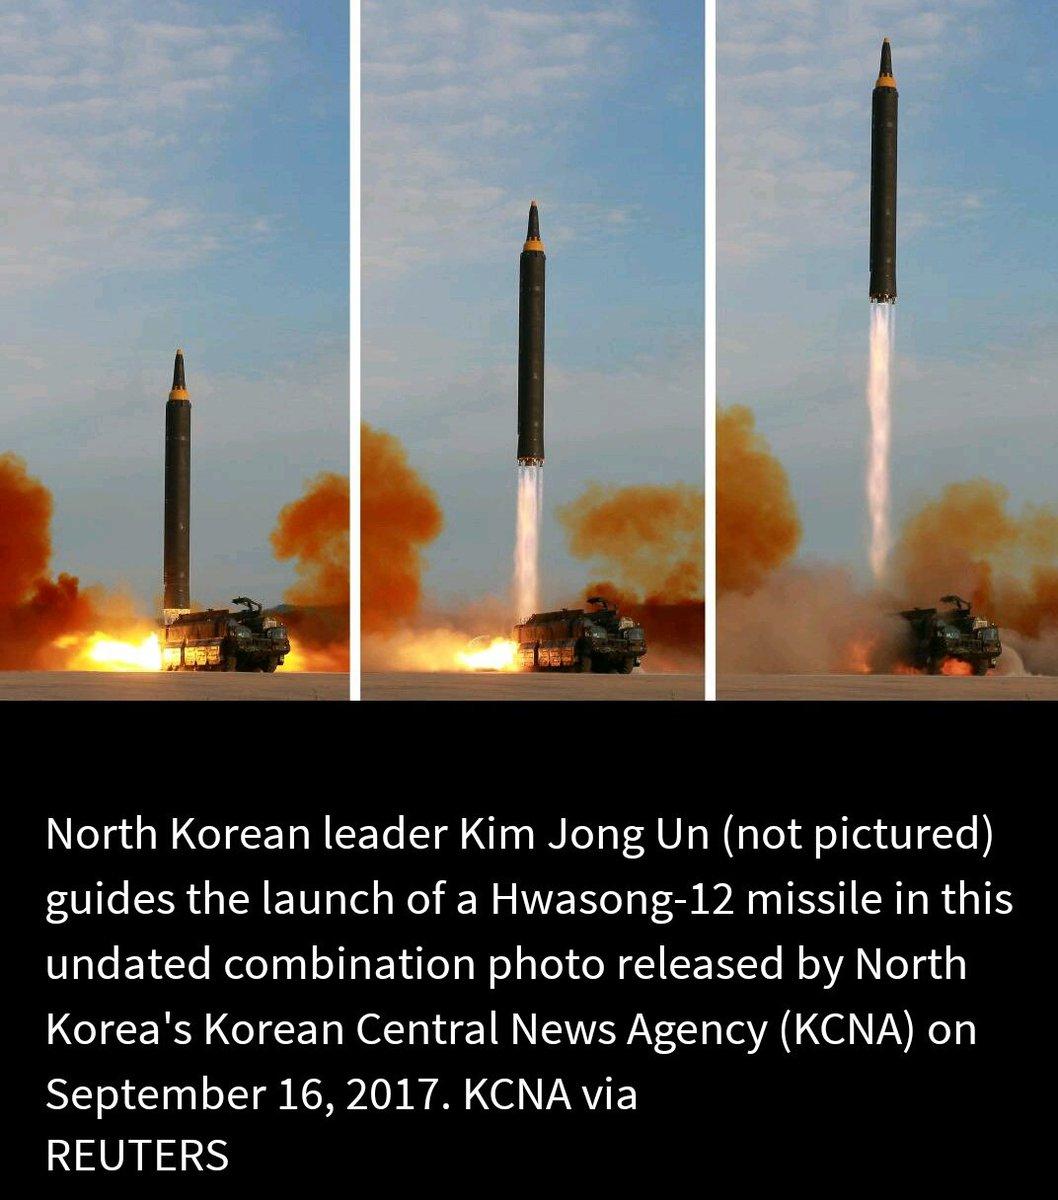 &quot;#NorthKorea says seeking military &#39;equilibrium&#39; with U.S.&quot; - #NorthKoreaNukes   http://www. reuters.com/article/us-nor thkorea-missiles/north-korea-says-seeking-military-equilibrium-with-u-s-idUSKCN1BP35B &nbsp; … <br>http://pic.twitter.com/aGbkIP58Oq